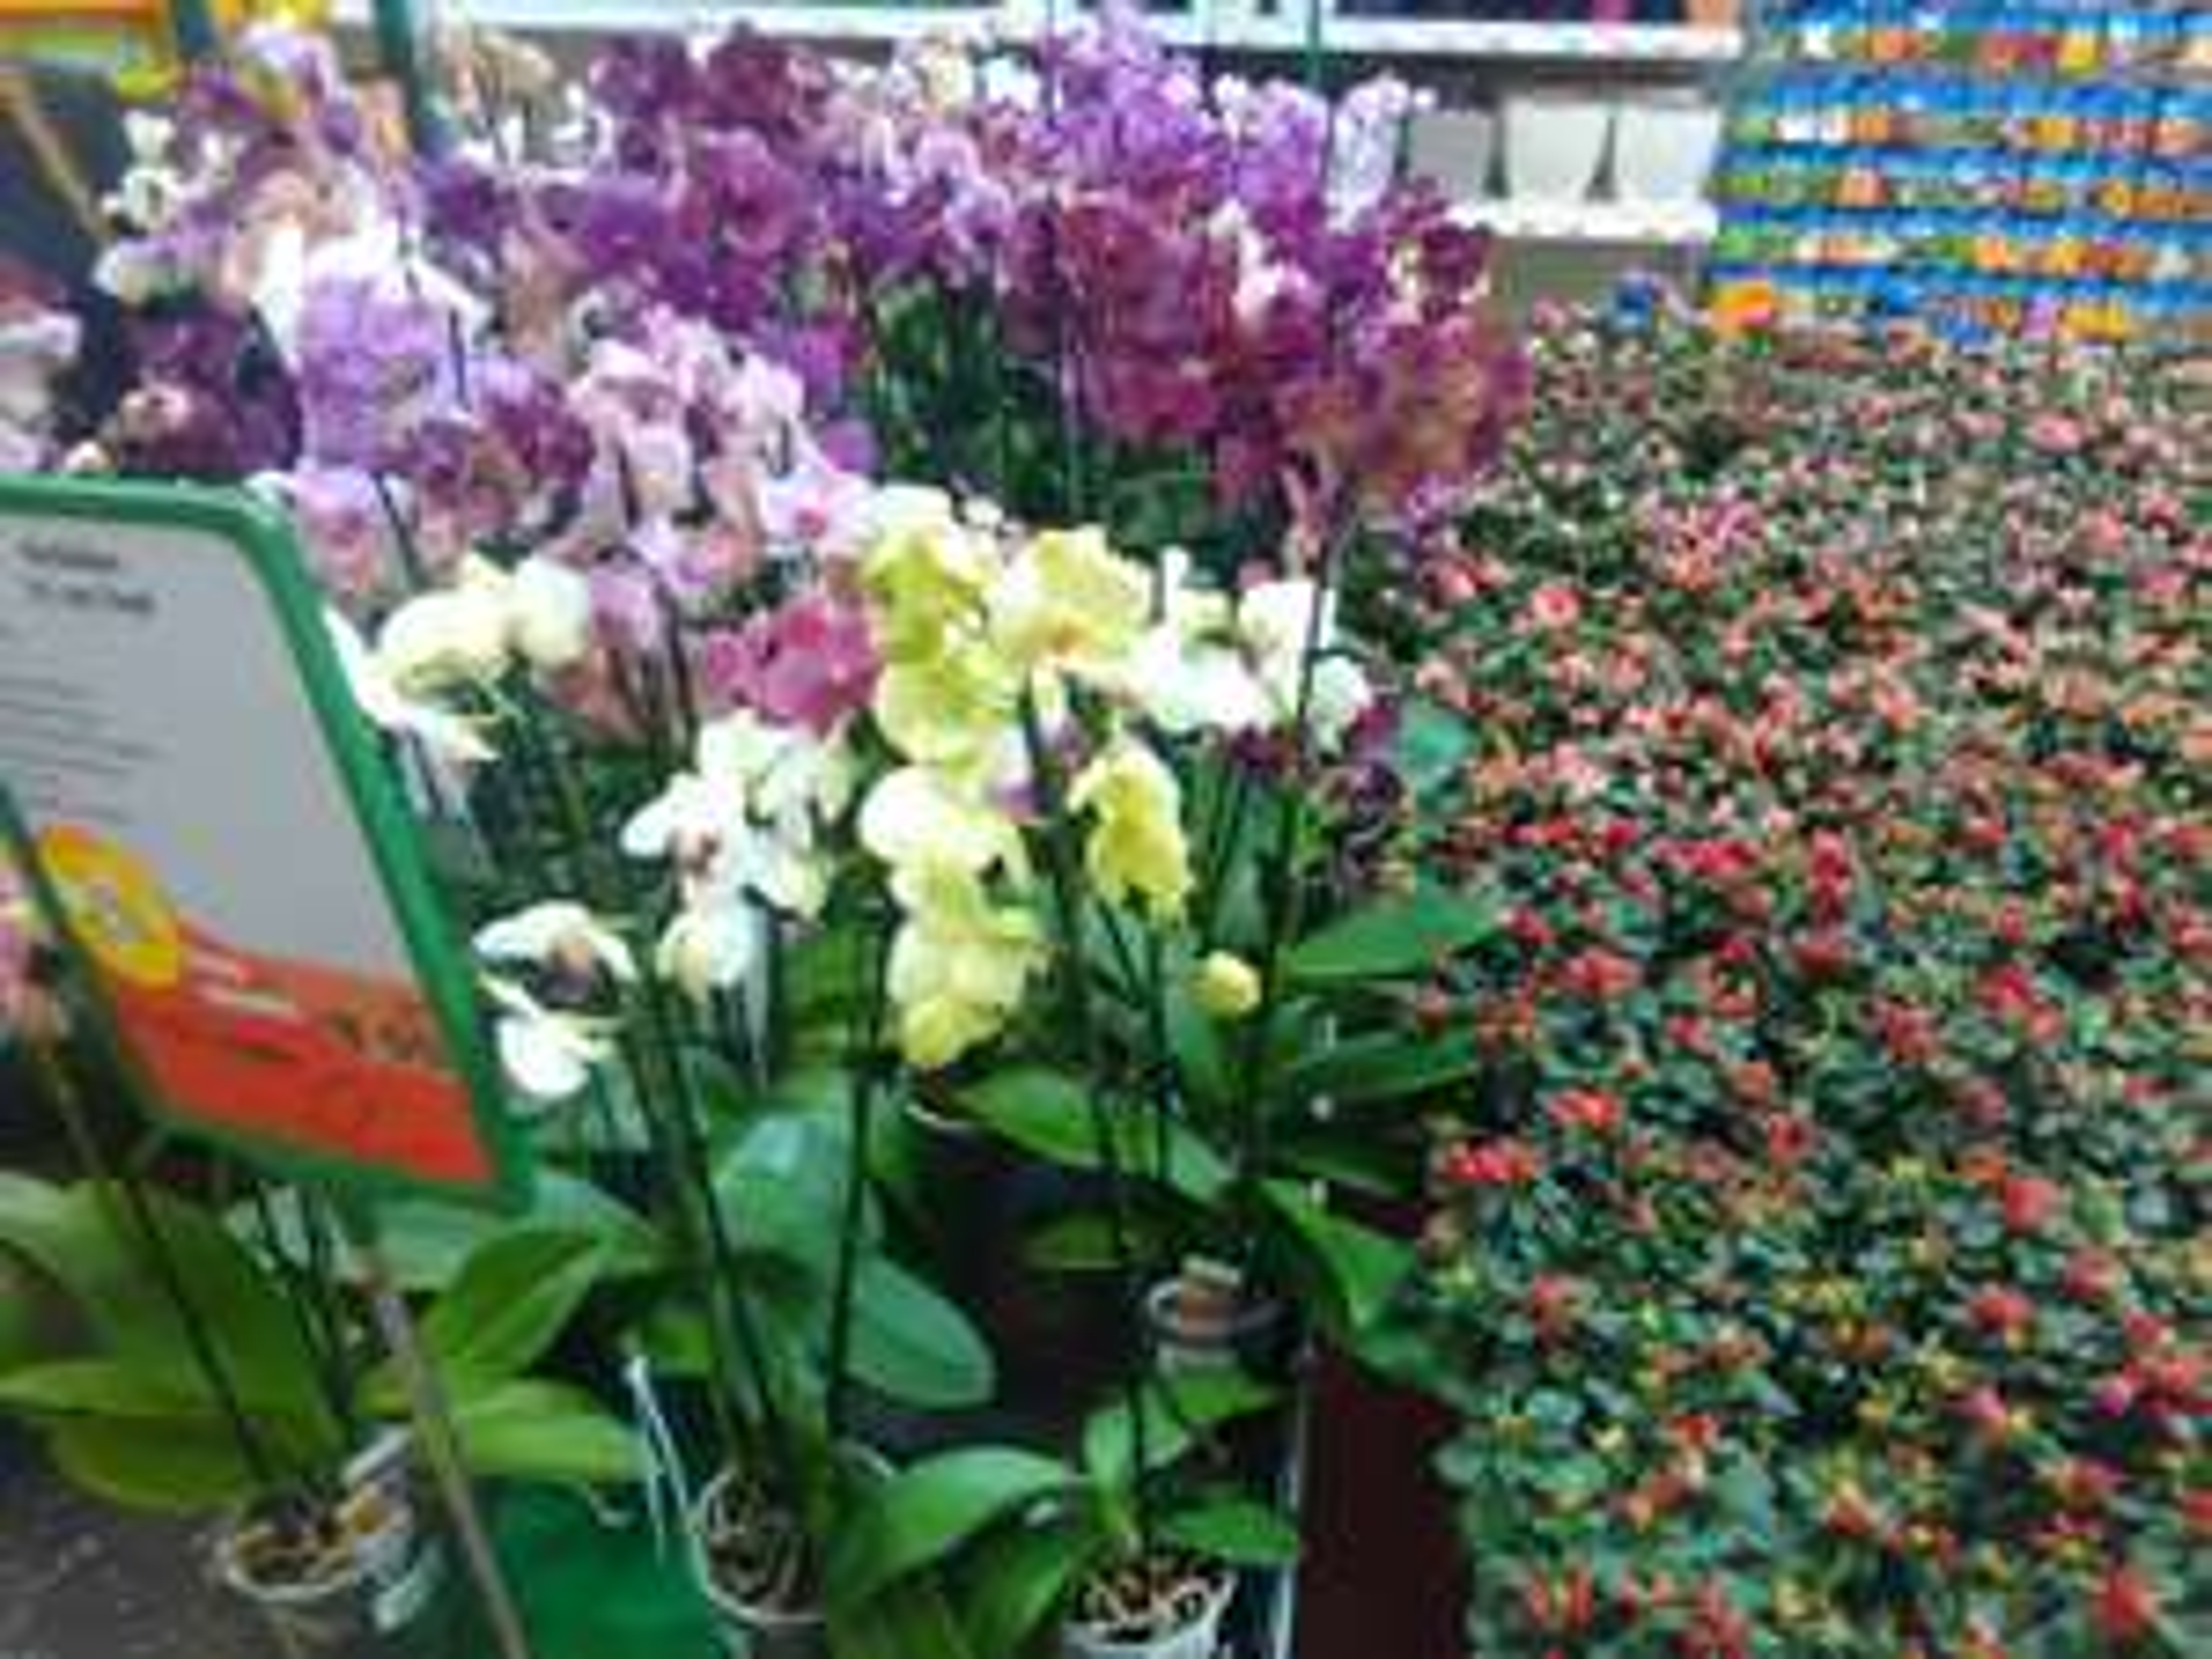 Orchideen GLOBUS-Baumärkte 2,00€(!!)